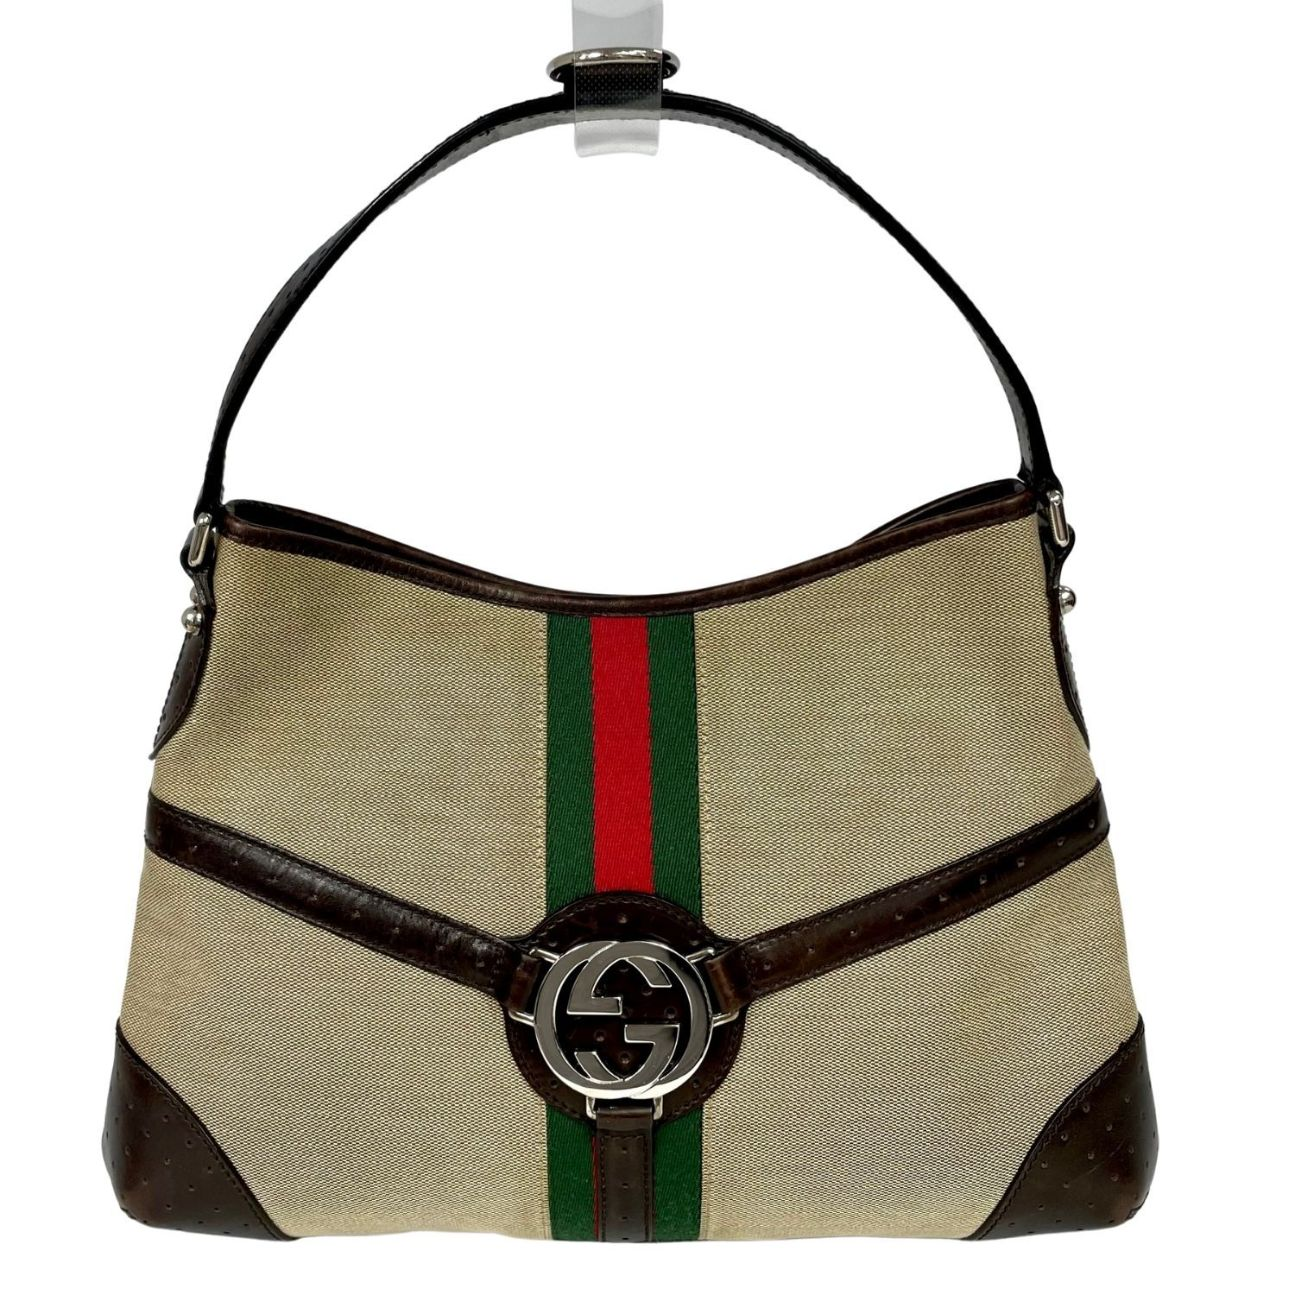 Bolsa Gucci Interlocking G Reins Hobo